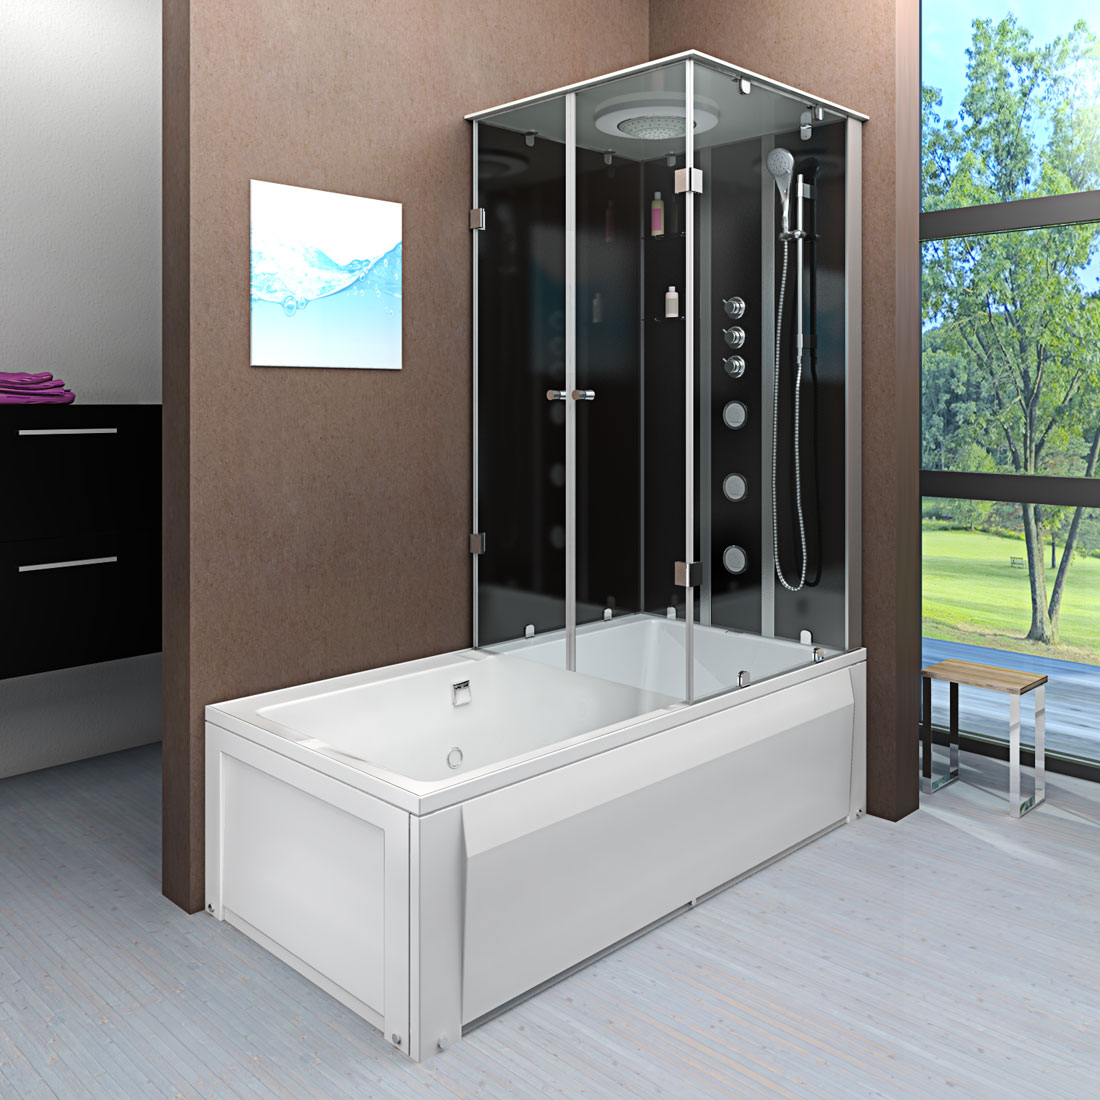 acquavapore dtp50 a304l dusch wannen kombi in 180x90cm trendbad24. Black Bedroom Furniture Sets. Home Design Ideas